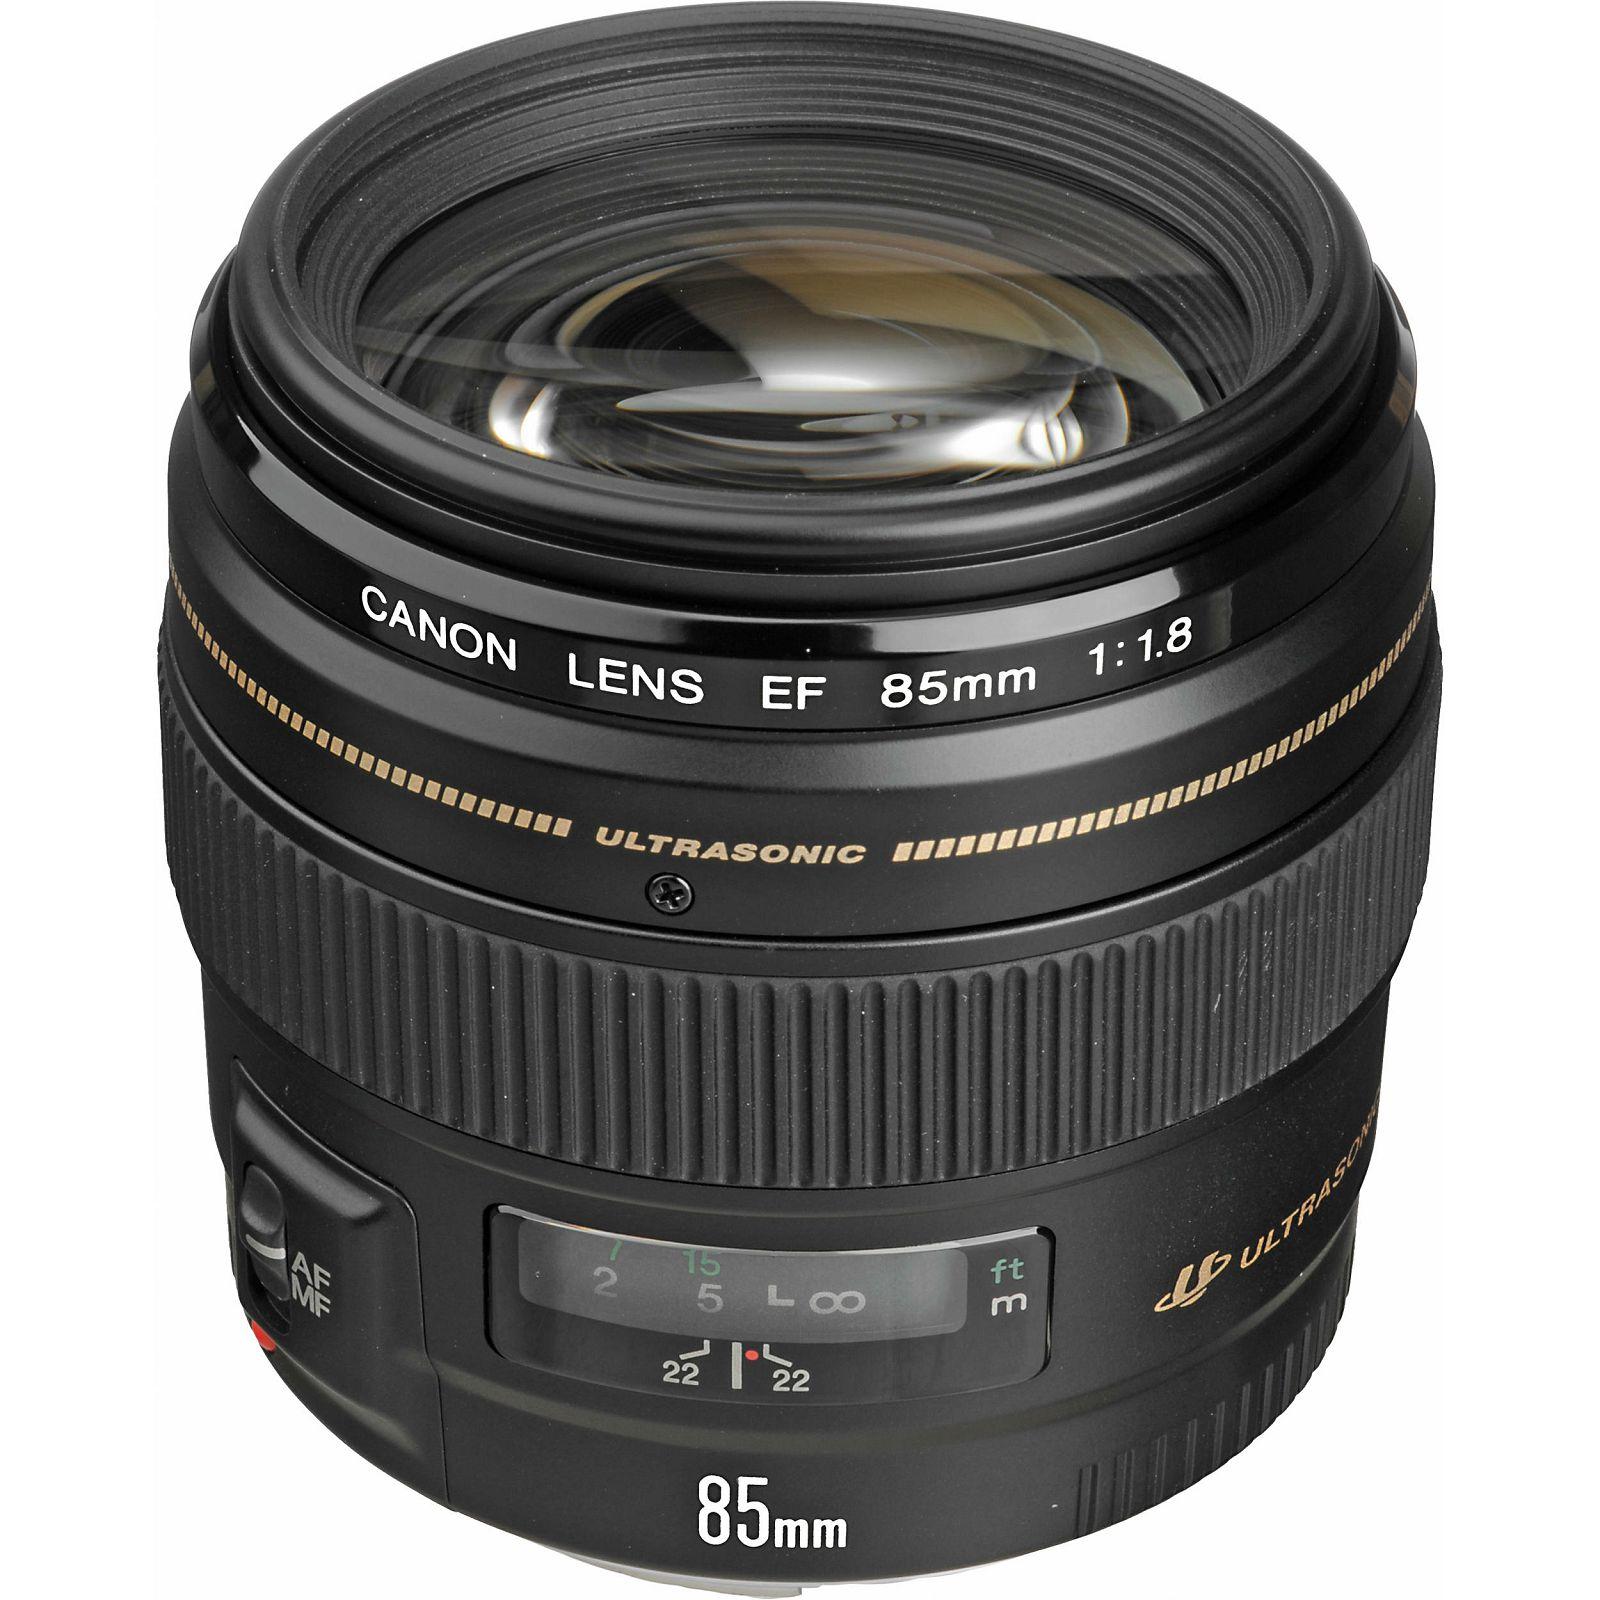 Canon EF 85mm f/1.8 USM portretni telefoto objektiv 85 1.8 1,8 (2519A012AA)